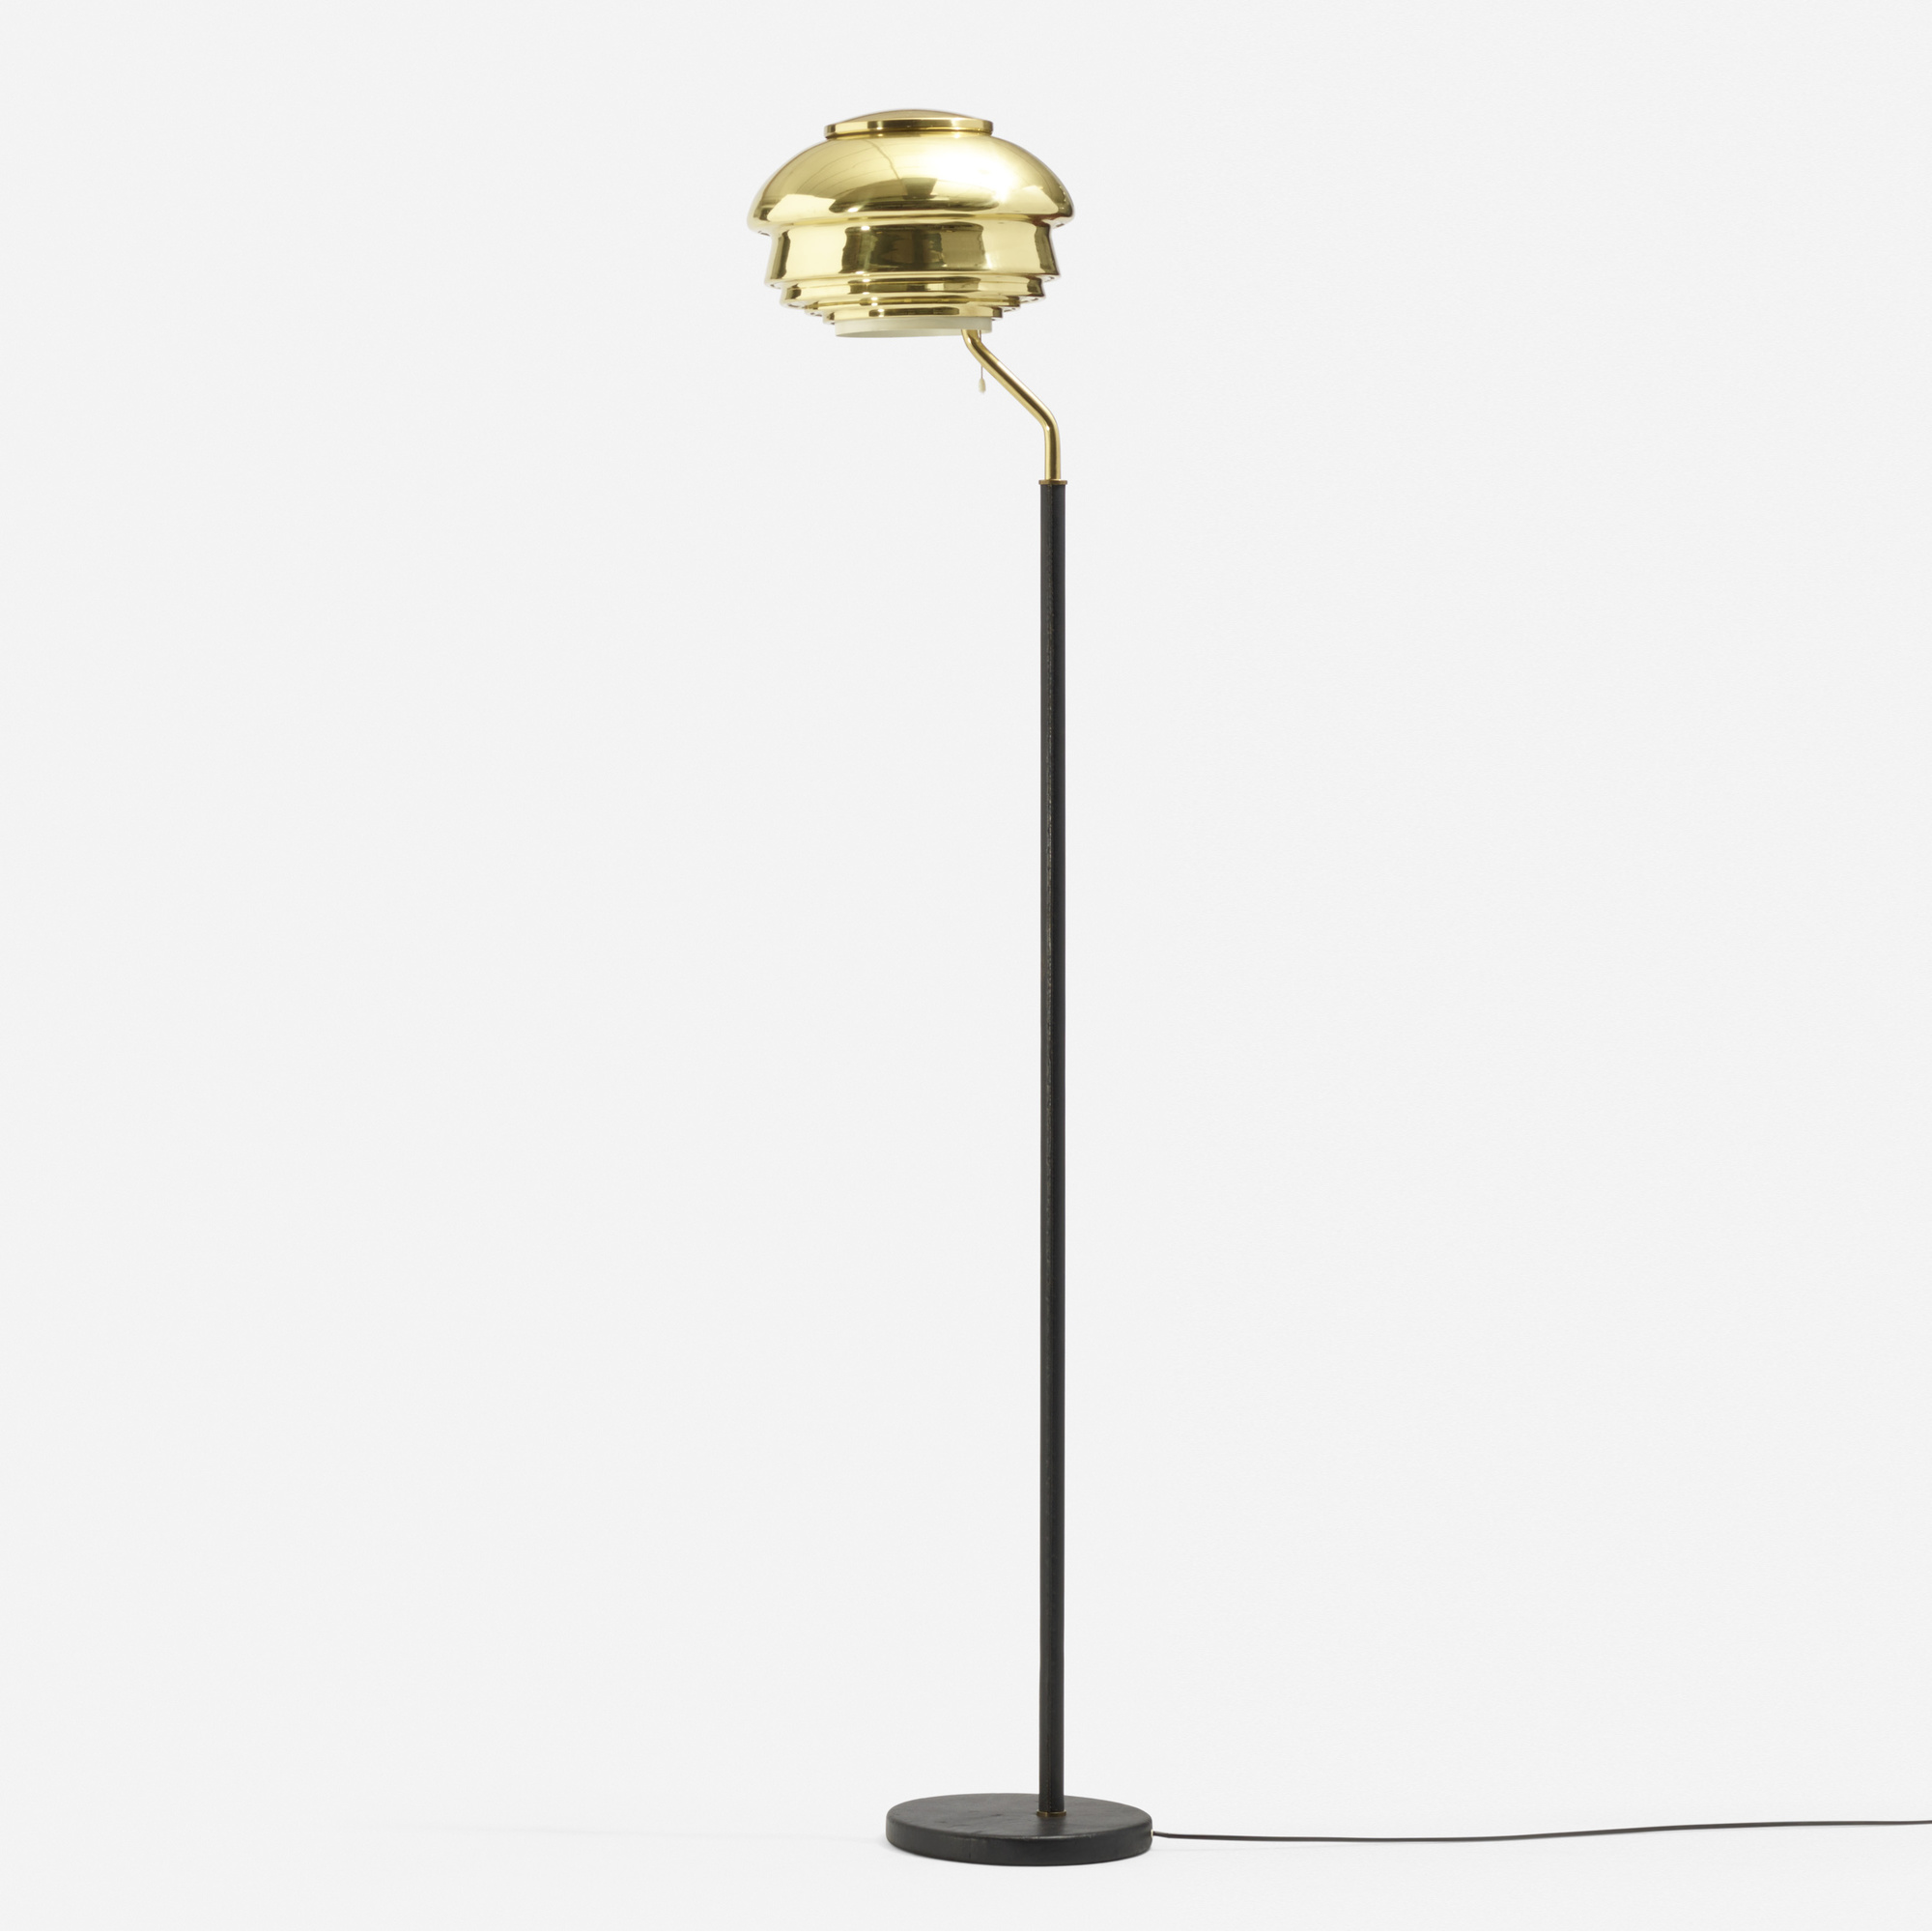 333: Alvar Aalto / floor lamp, model A808 (1 of 1)